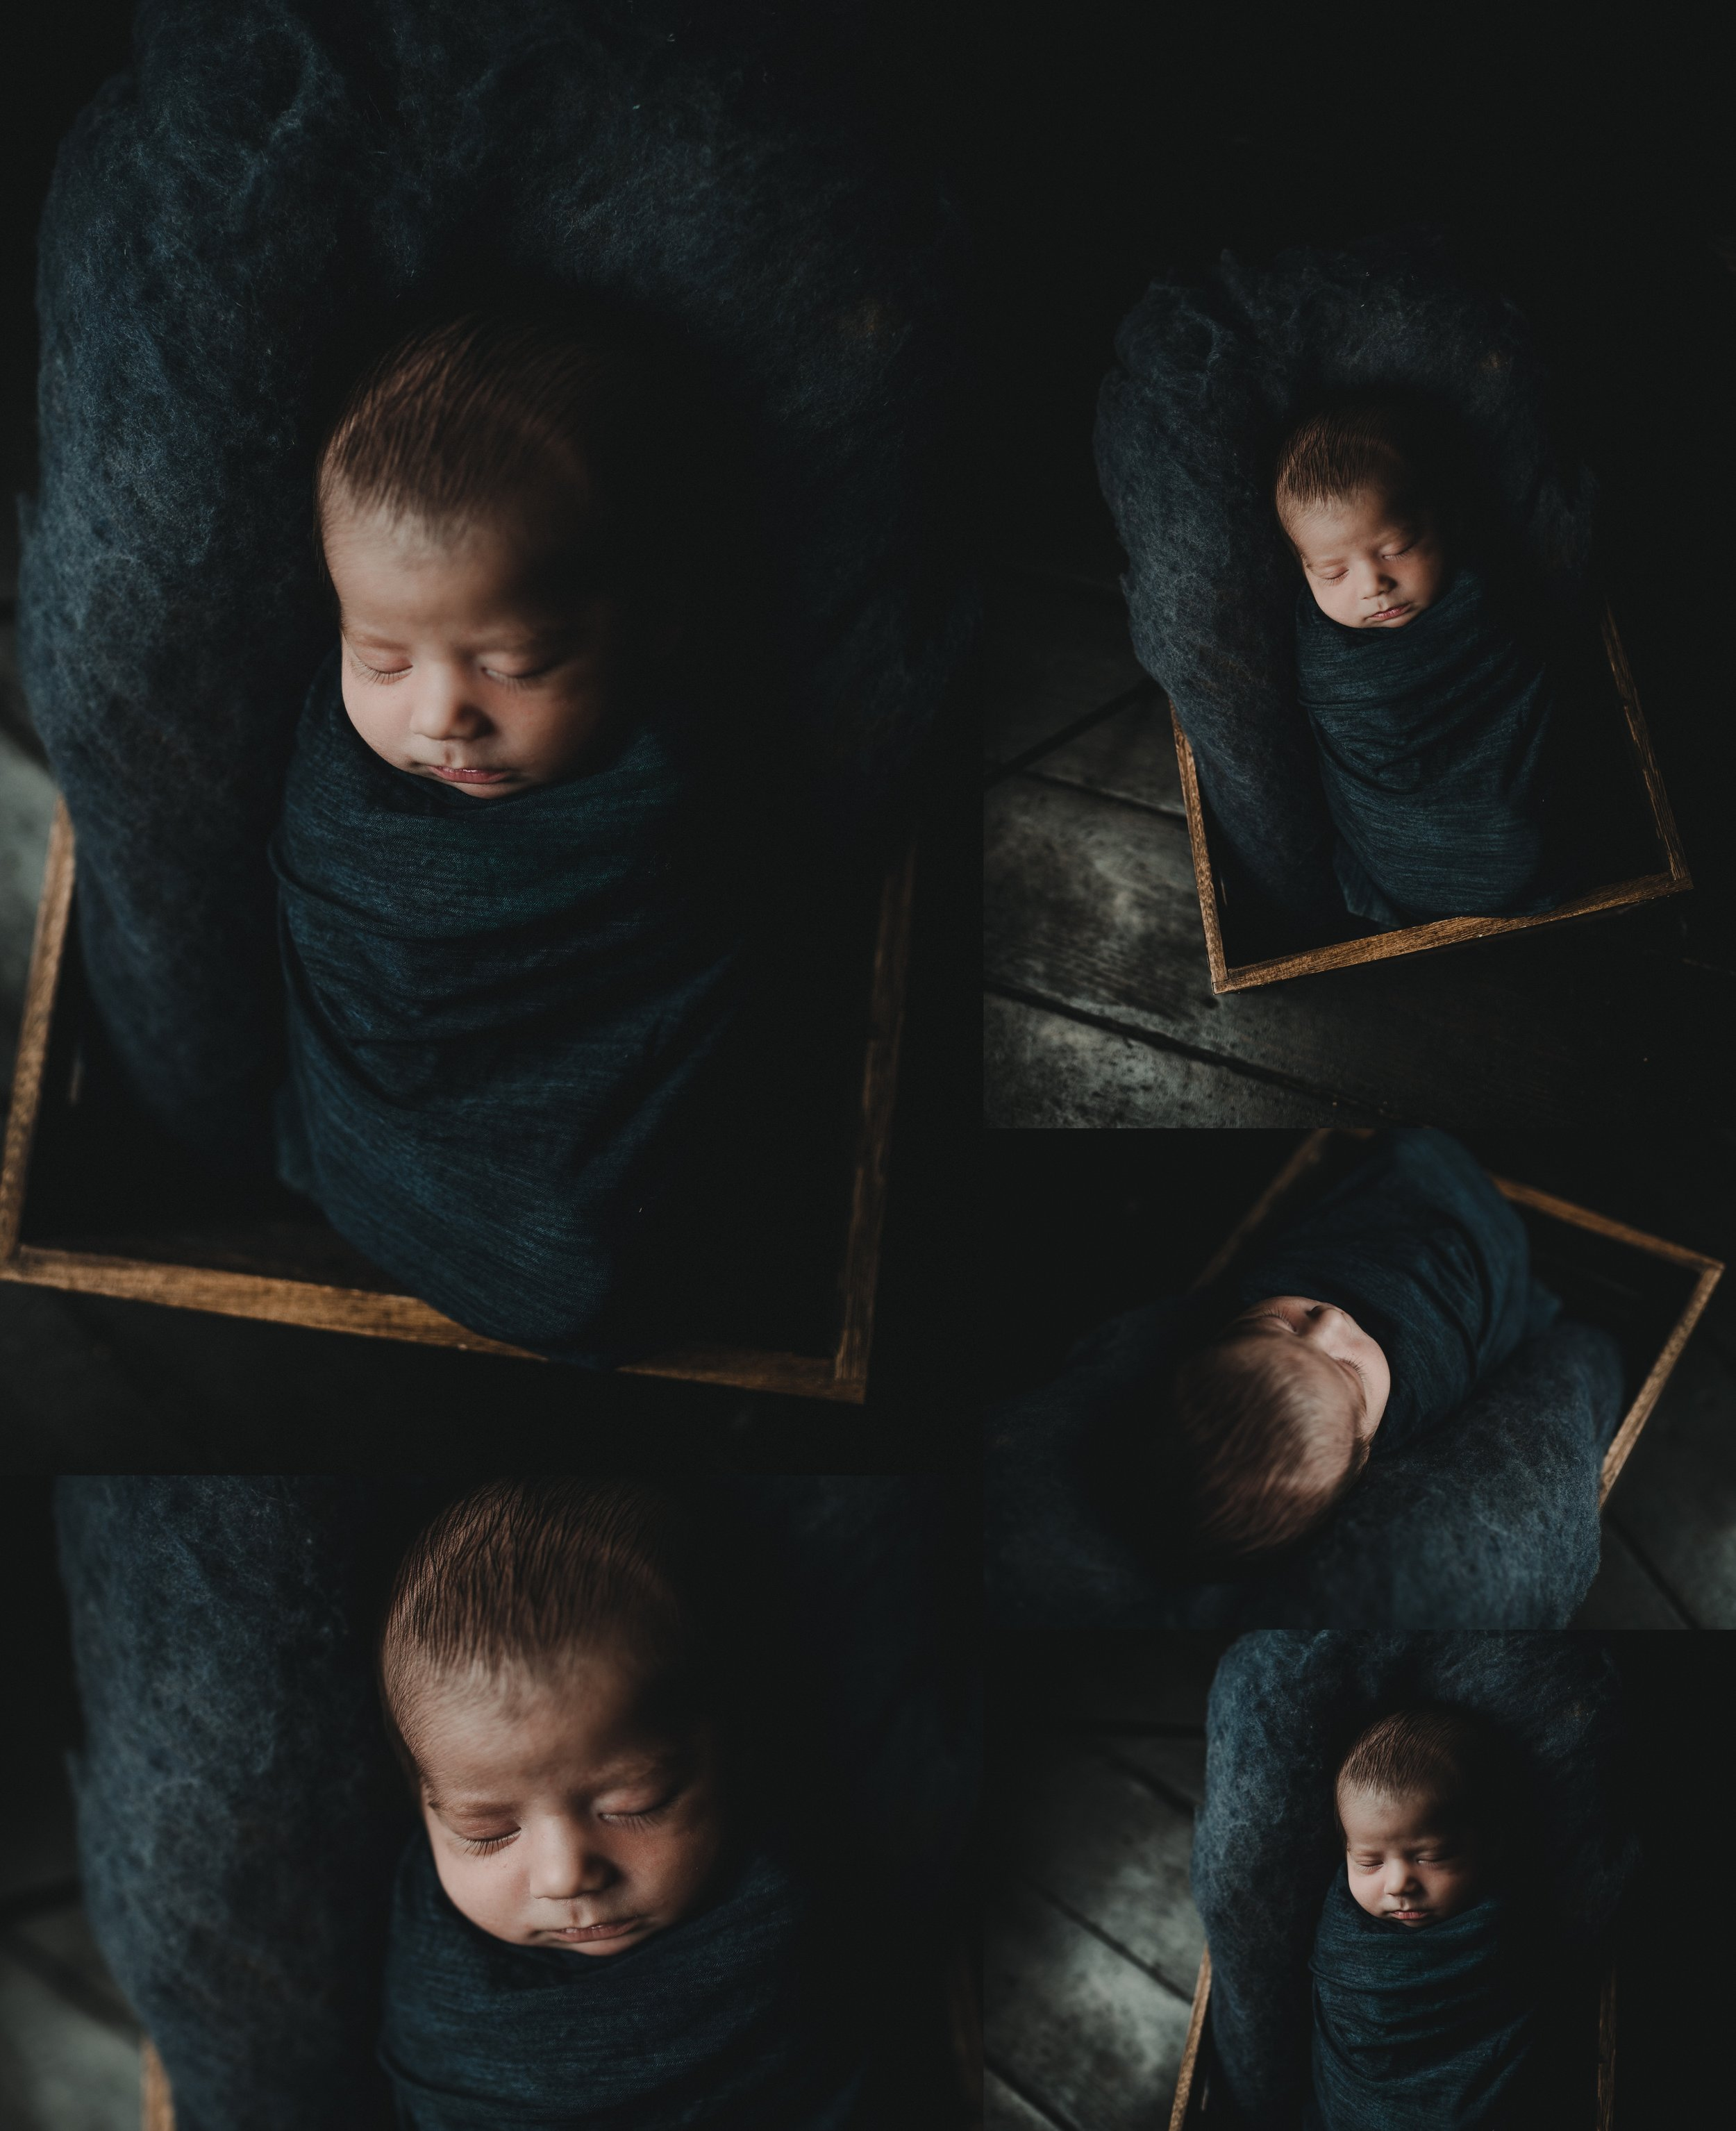 Farmhouse Rustic Studio Newborn Session | Baby Boy | Barn wood | Terry Farms Photography